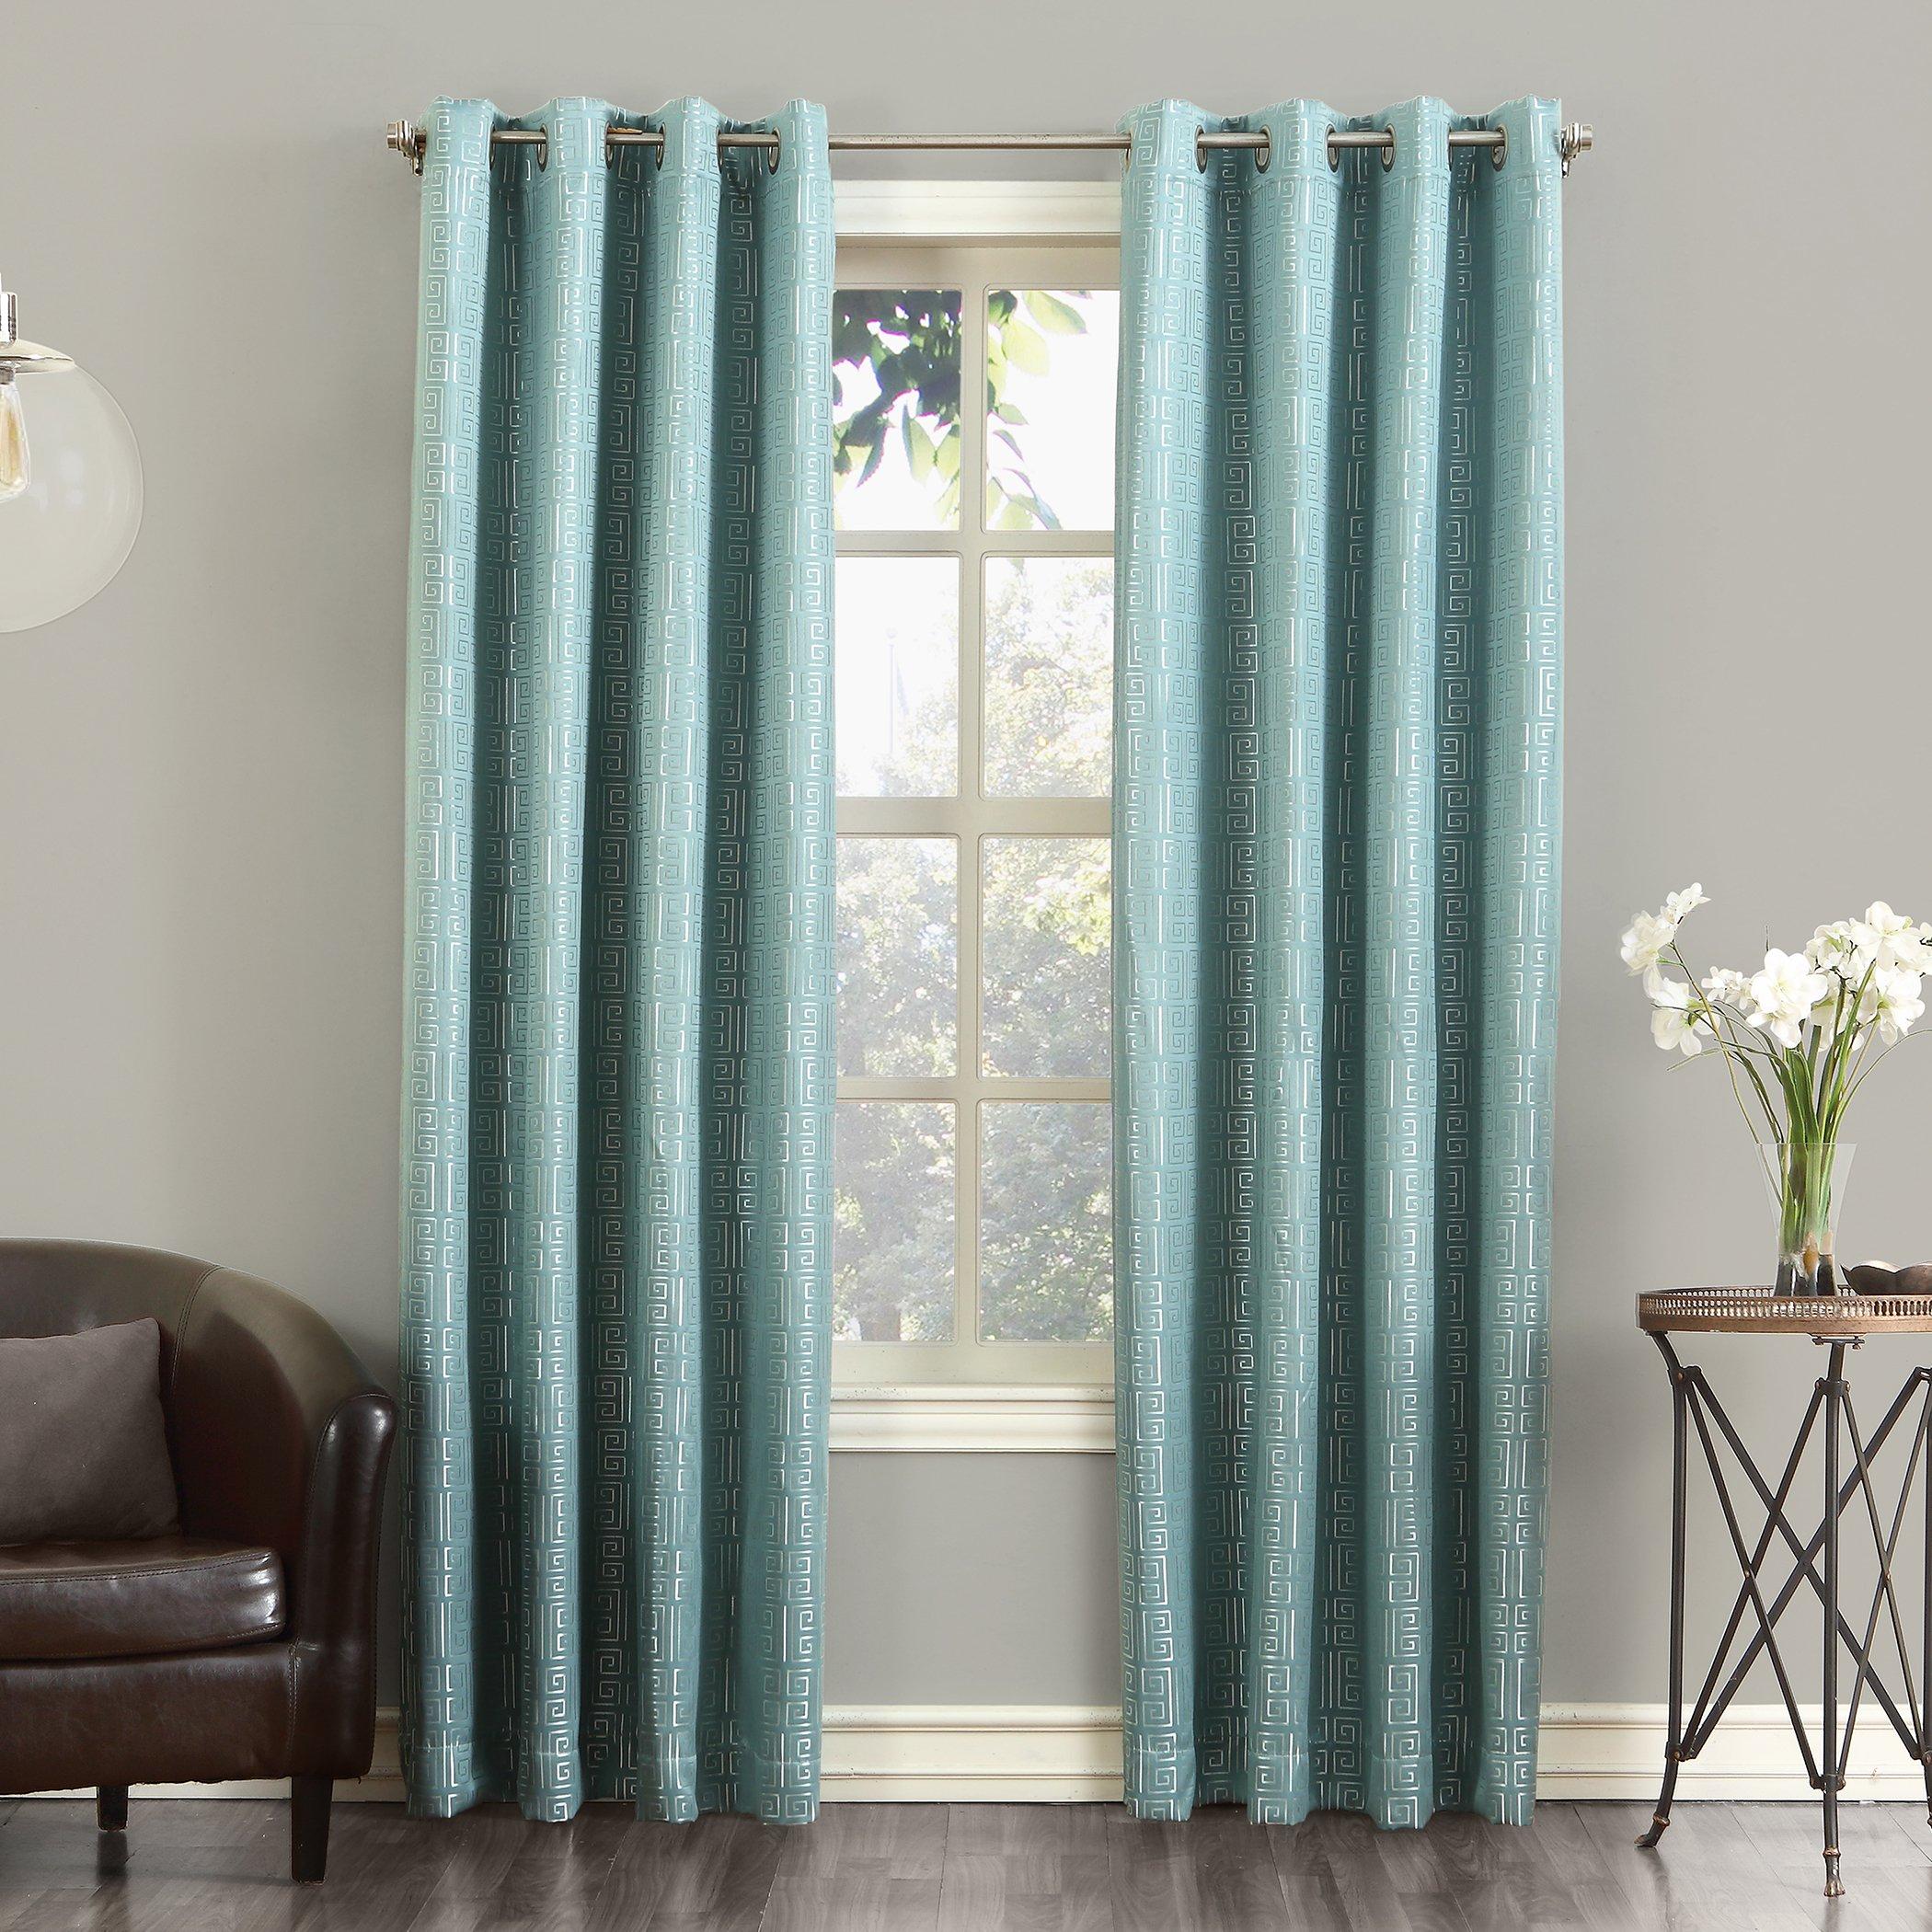 Sun Zero Theodore Blackout Lined Single Curtain Panel, 52'' x 63'', Spa Blue